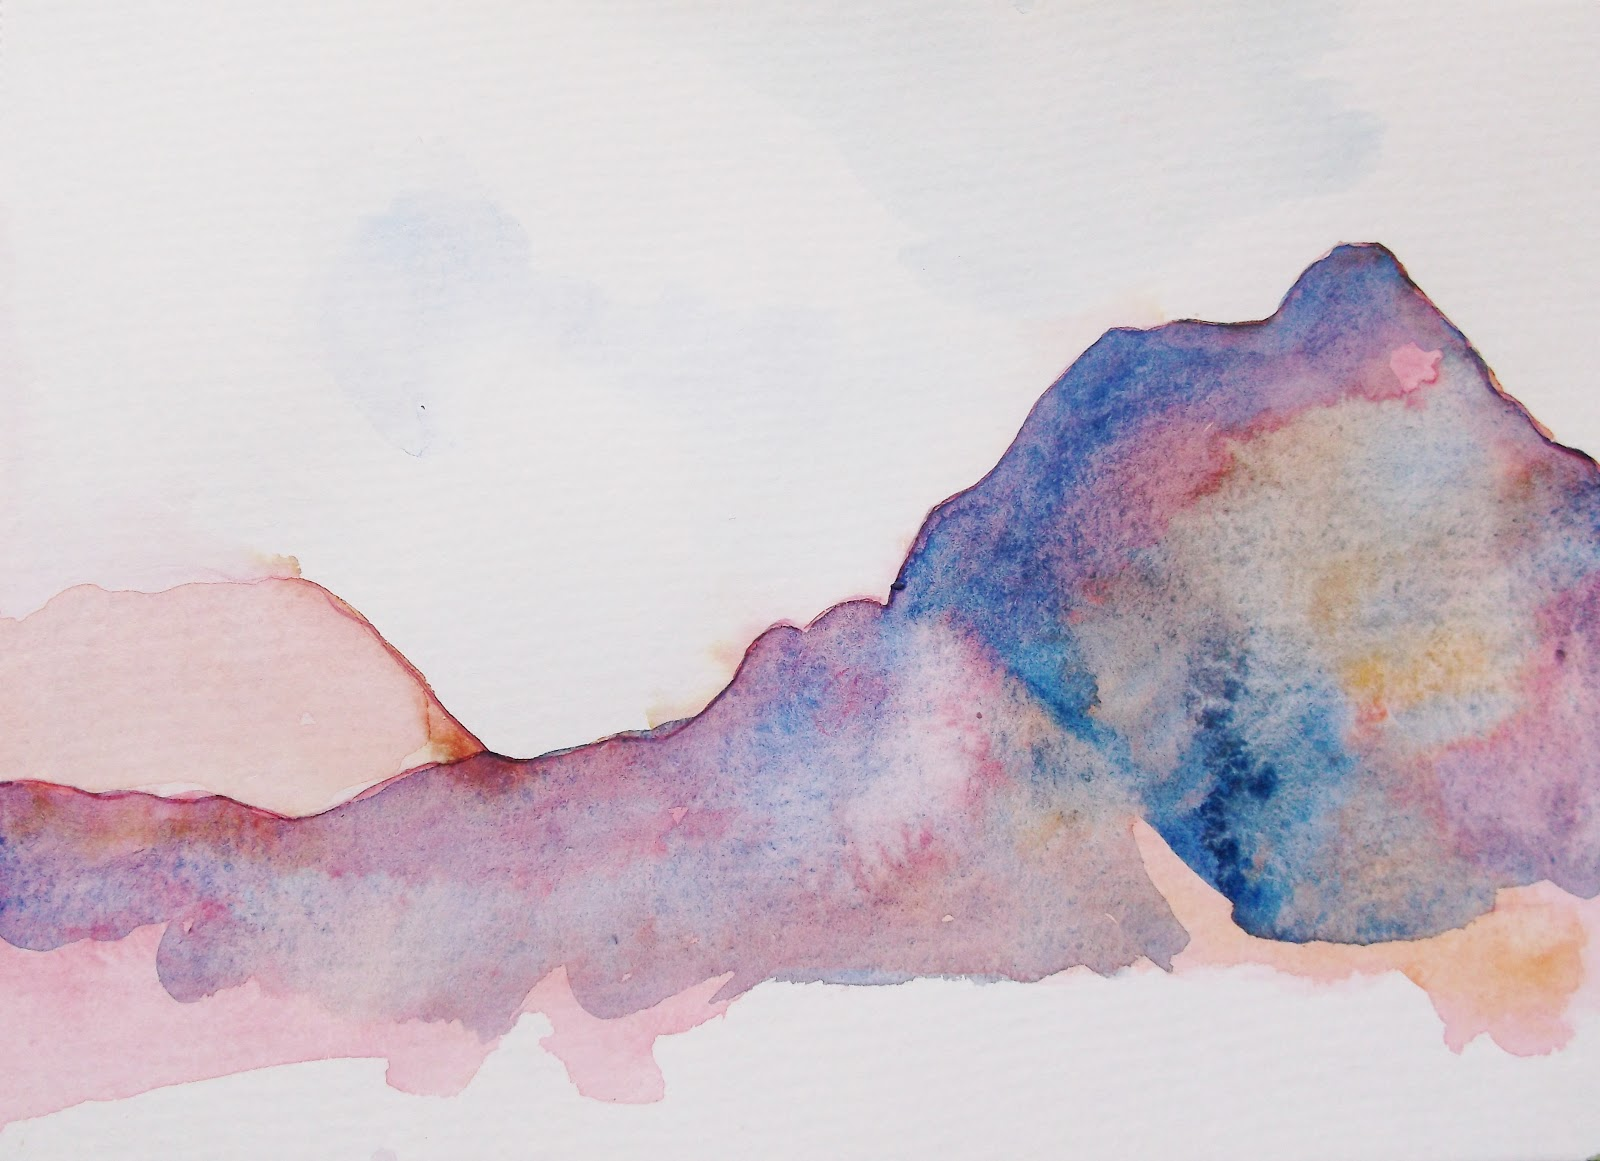 Line Art Watercolor : Primal marks koolau kualoa beach park